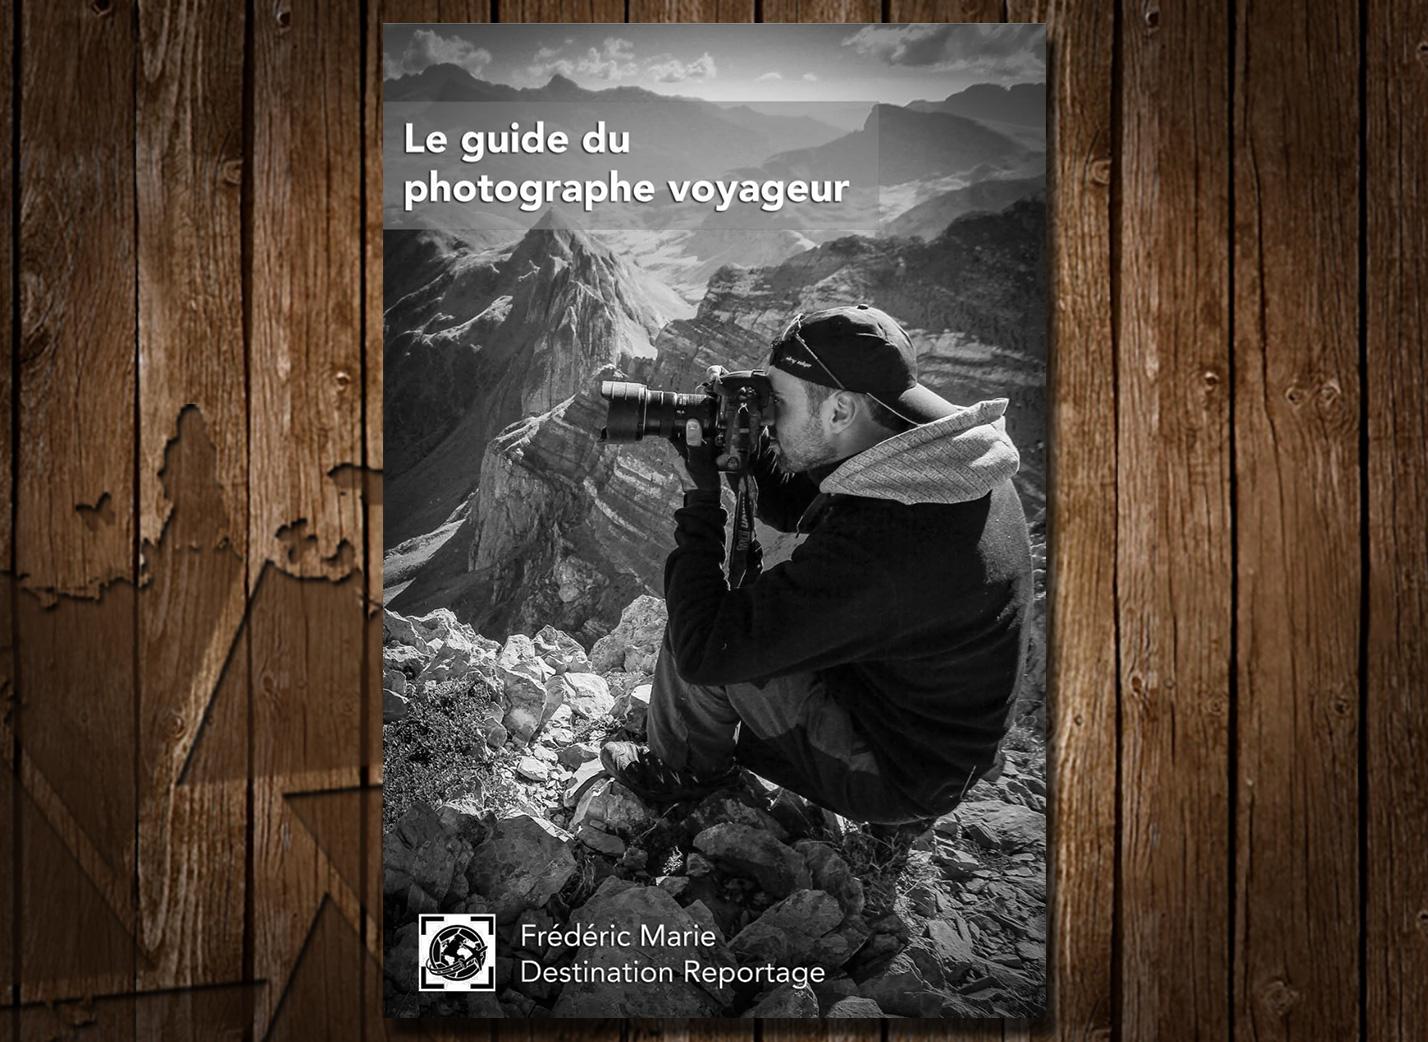 livre-guide-photographe-voyageur-featured-image